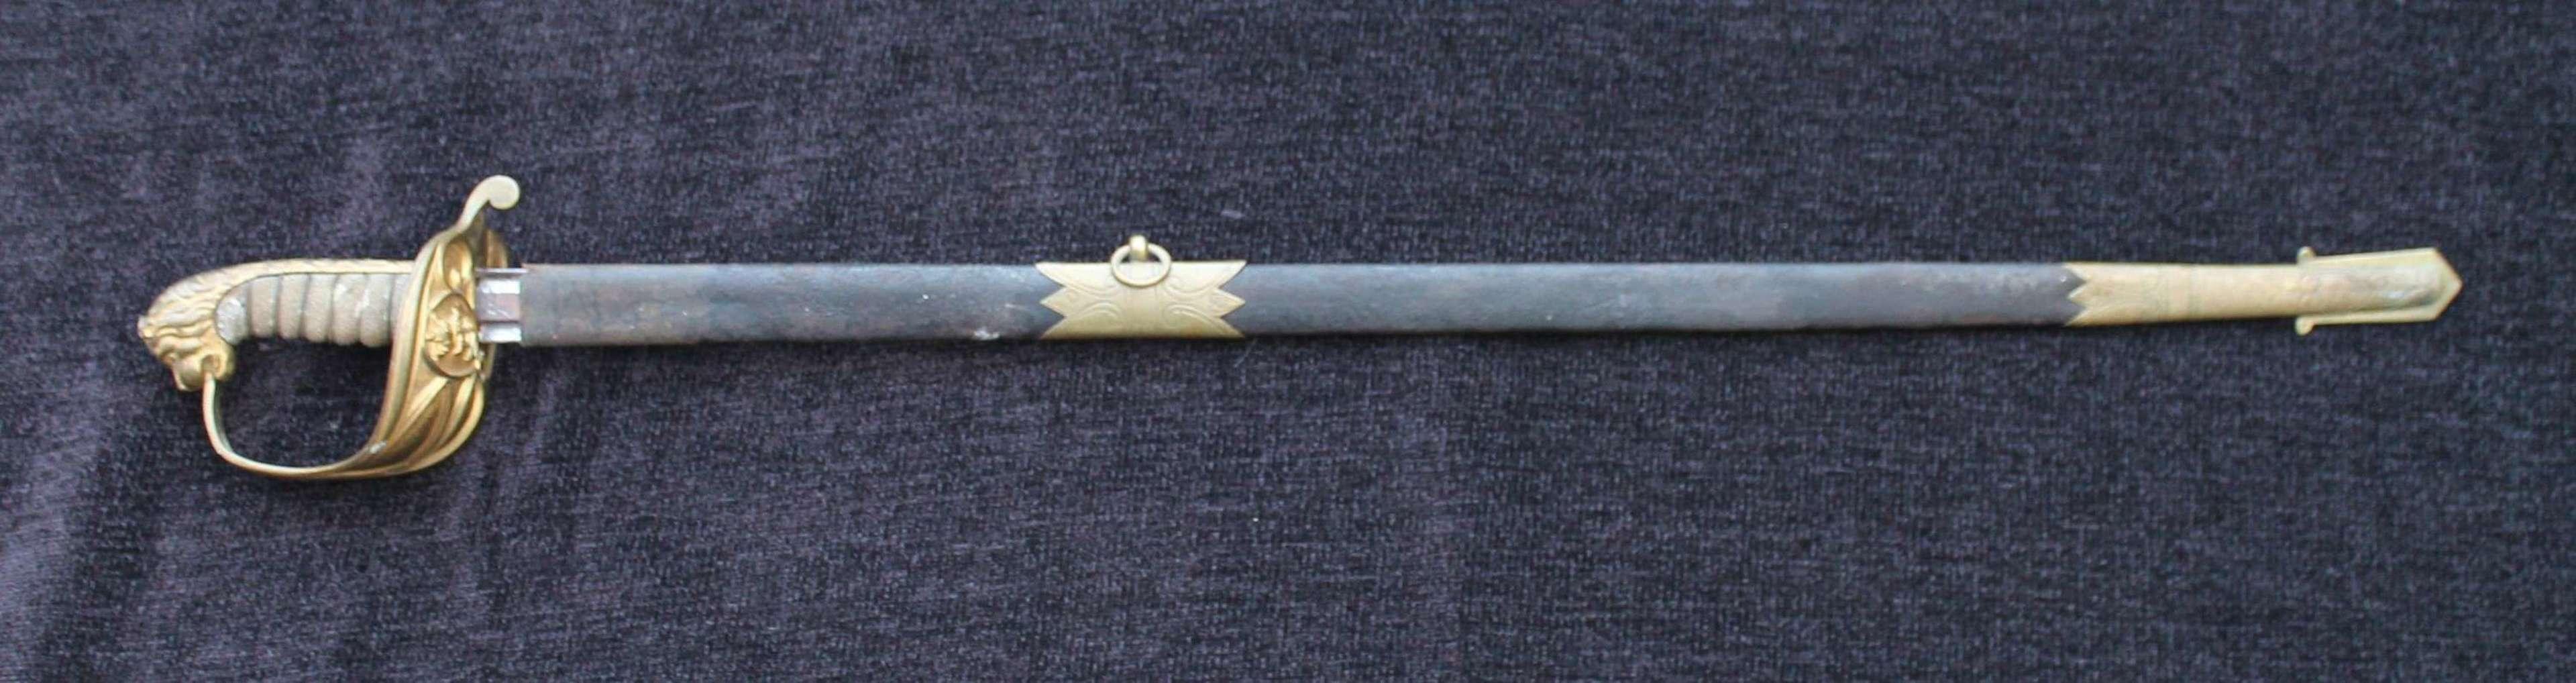 1827 Pattern Royal Naval Officers Sword Claymore Blade